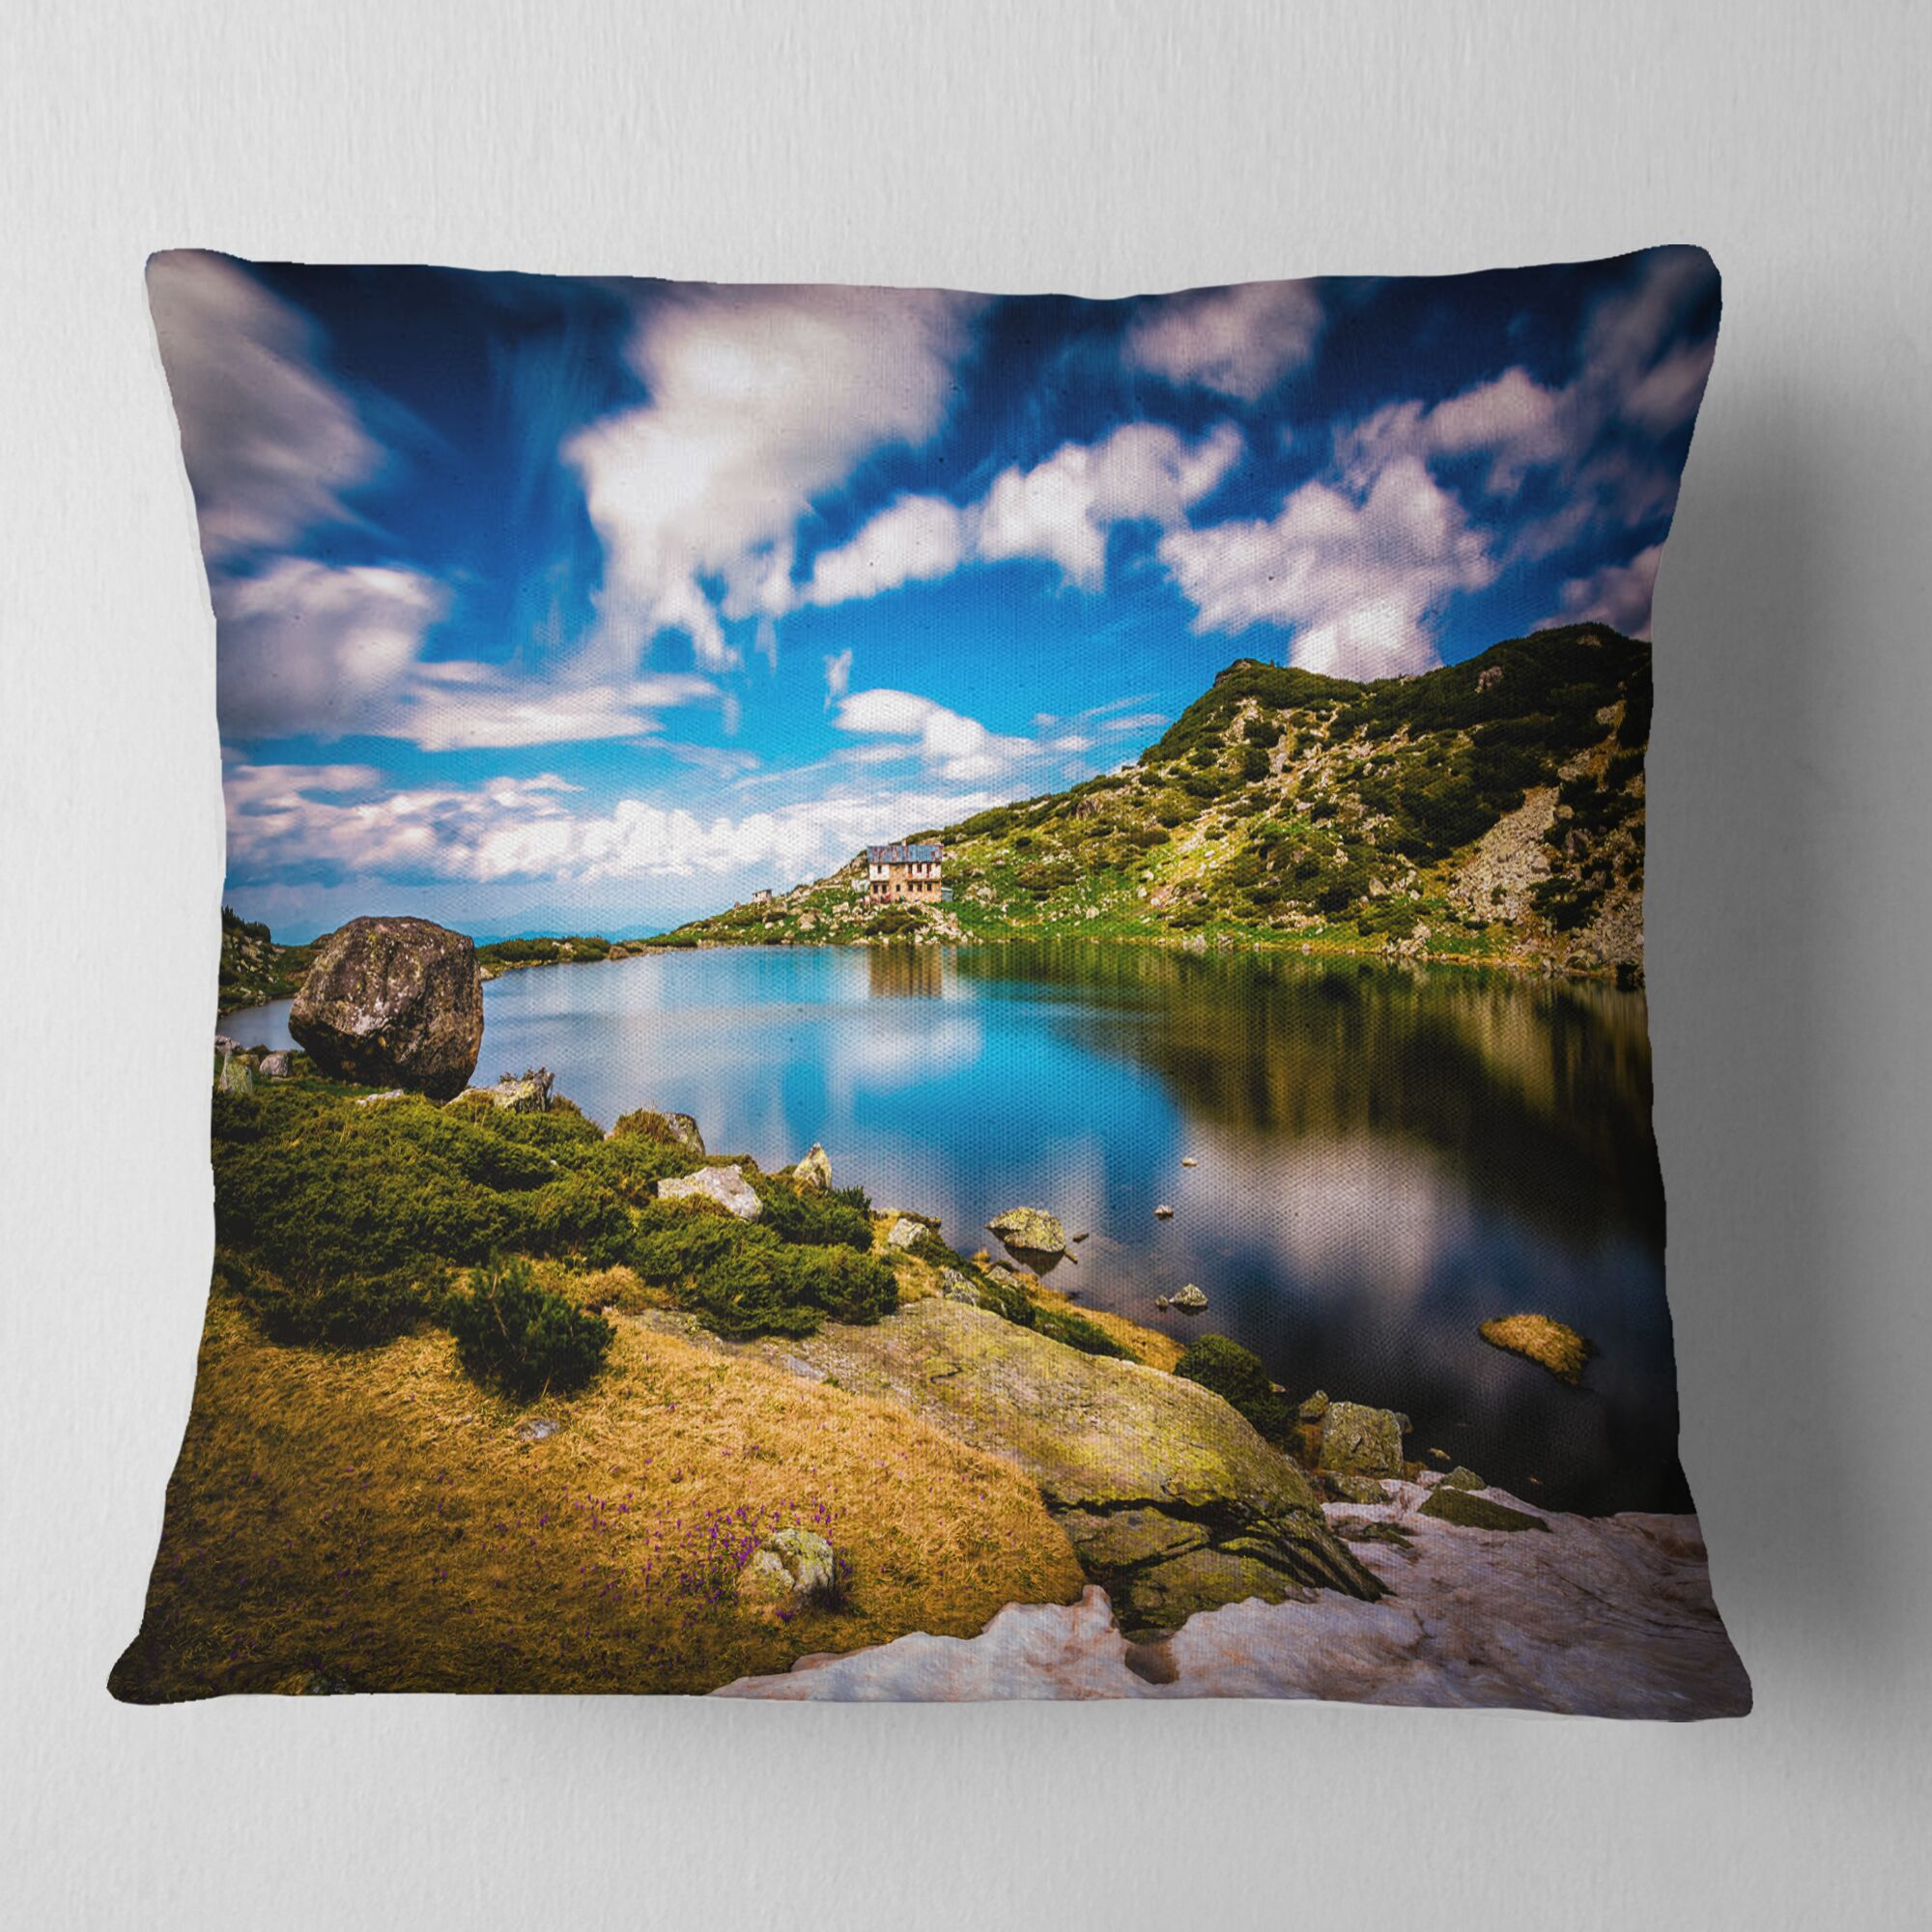 Long View of Seven Rila Lakes Landscape Printed Pillow Size: 26